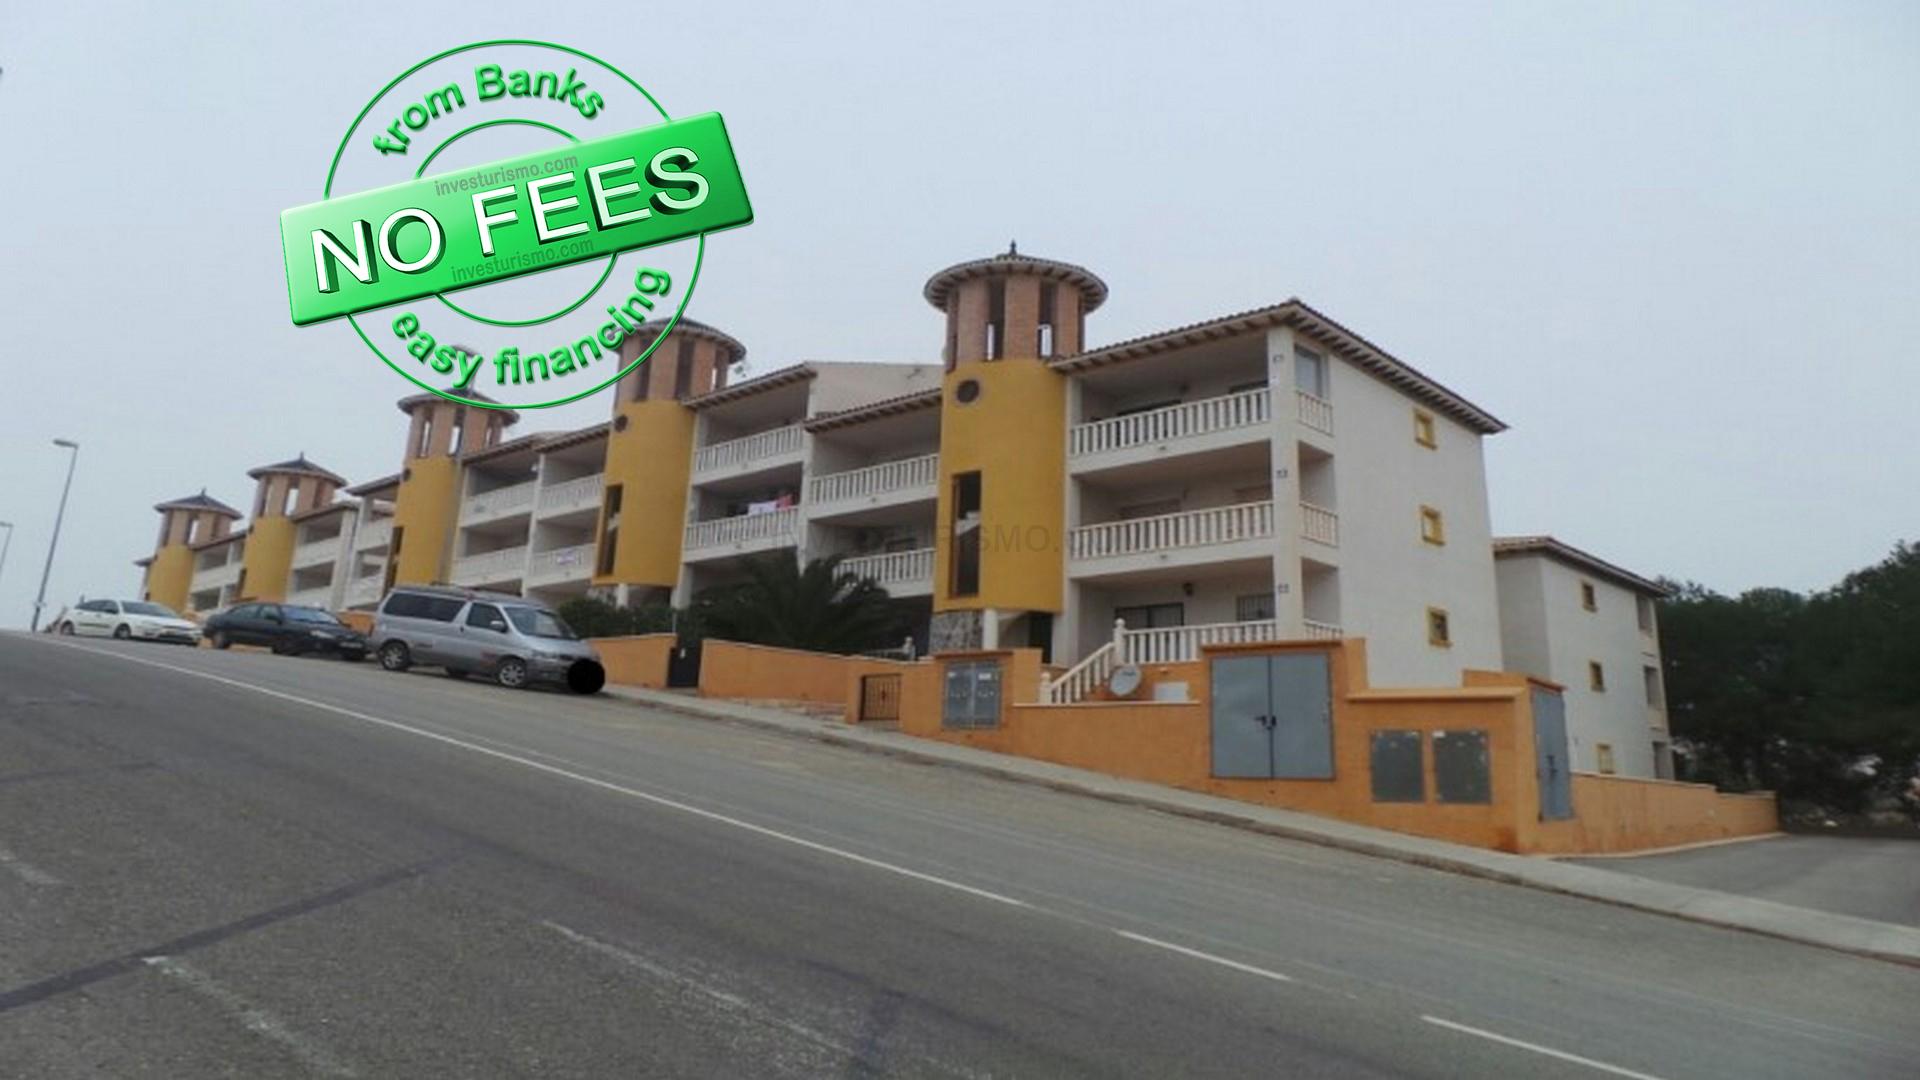 Apartment 2 bedrooms and 1 bathroom in Orihuela costa